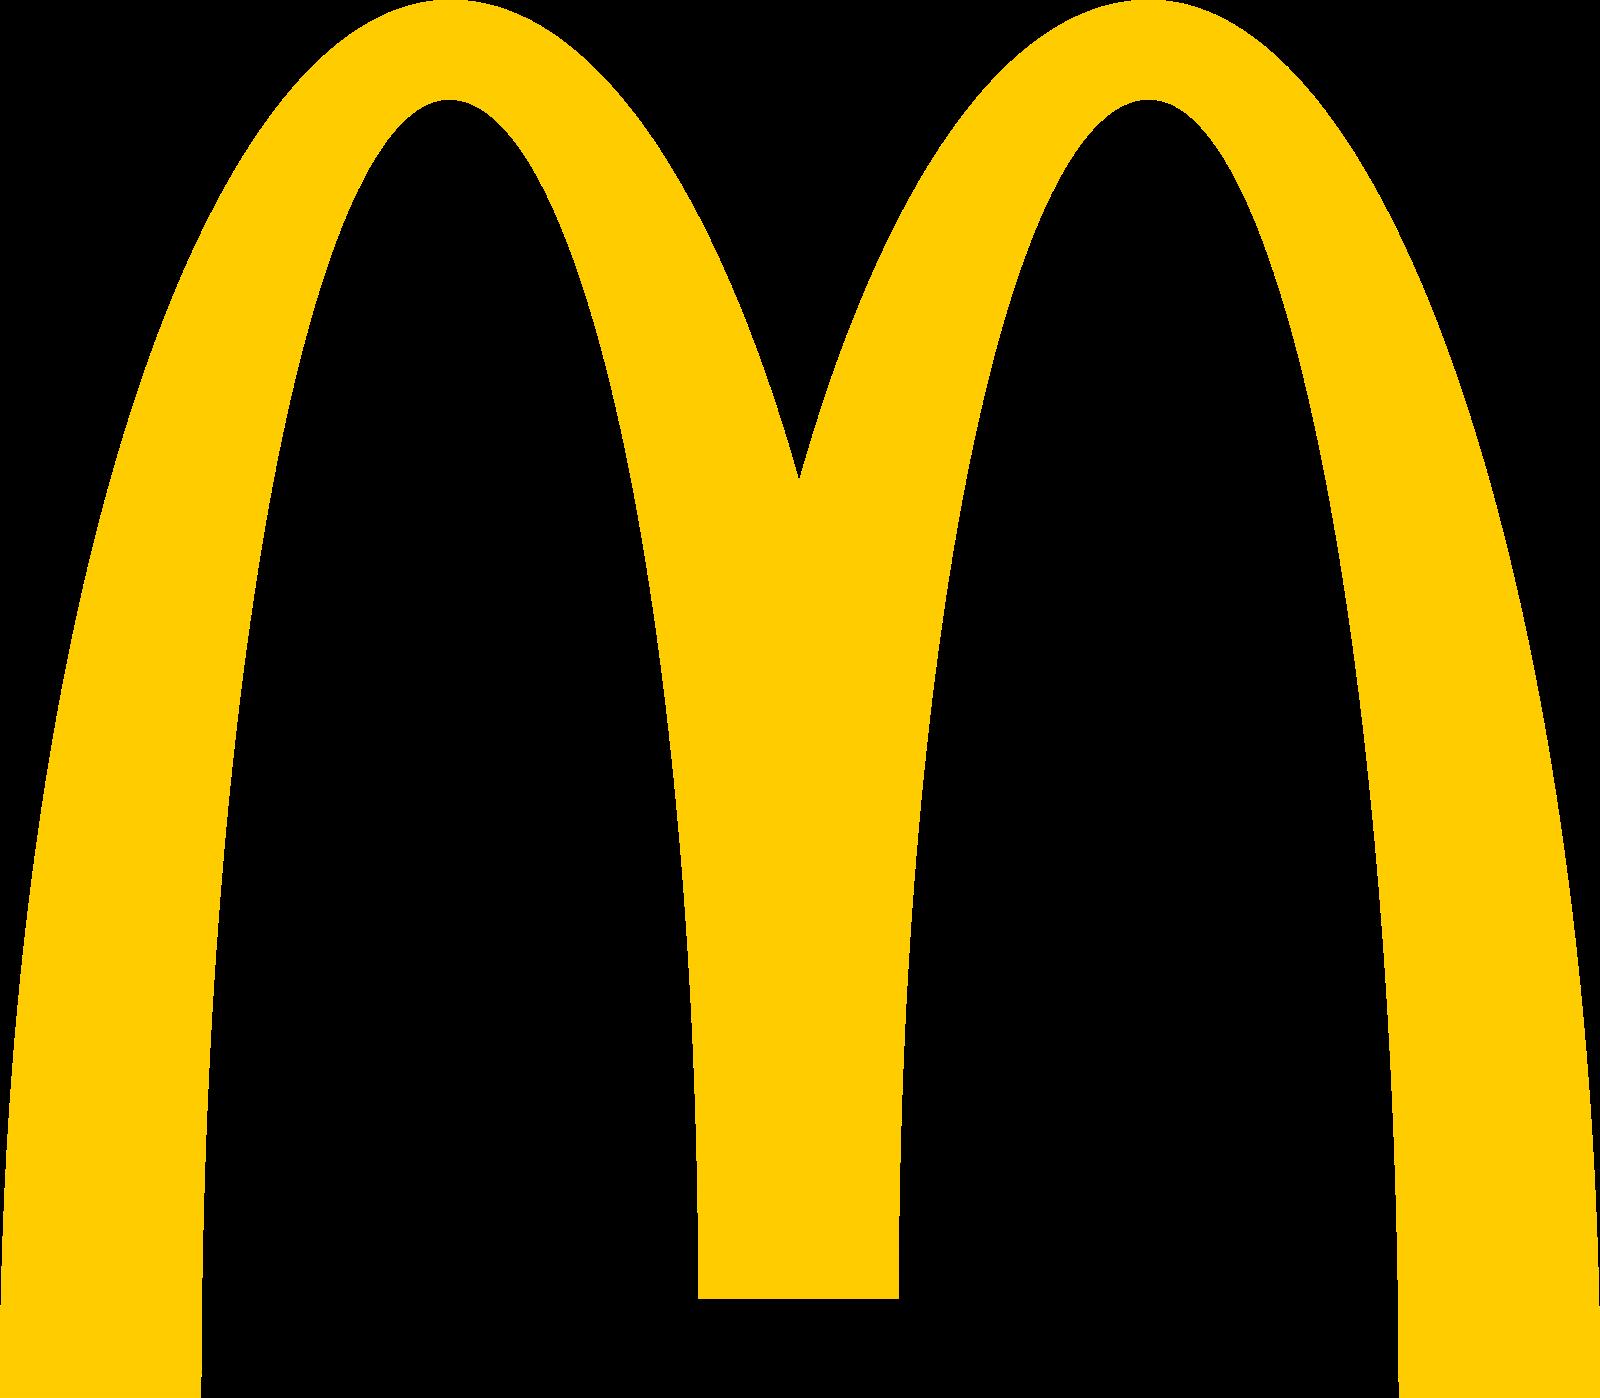 McDonalds logo 3 - McDonald's Logo